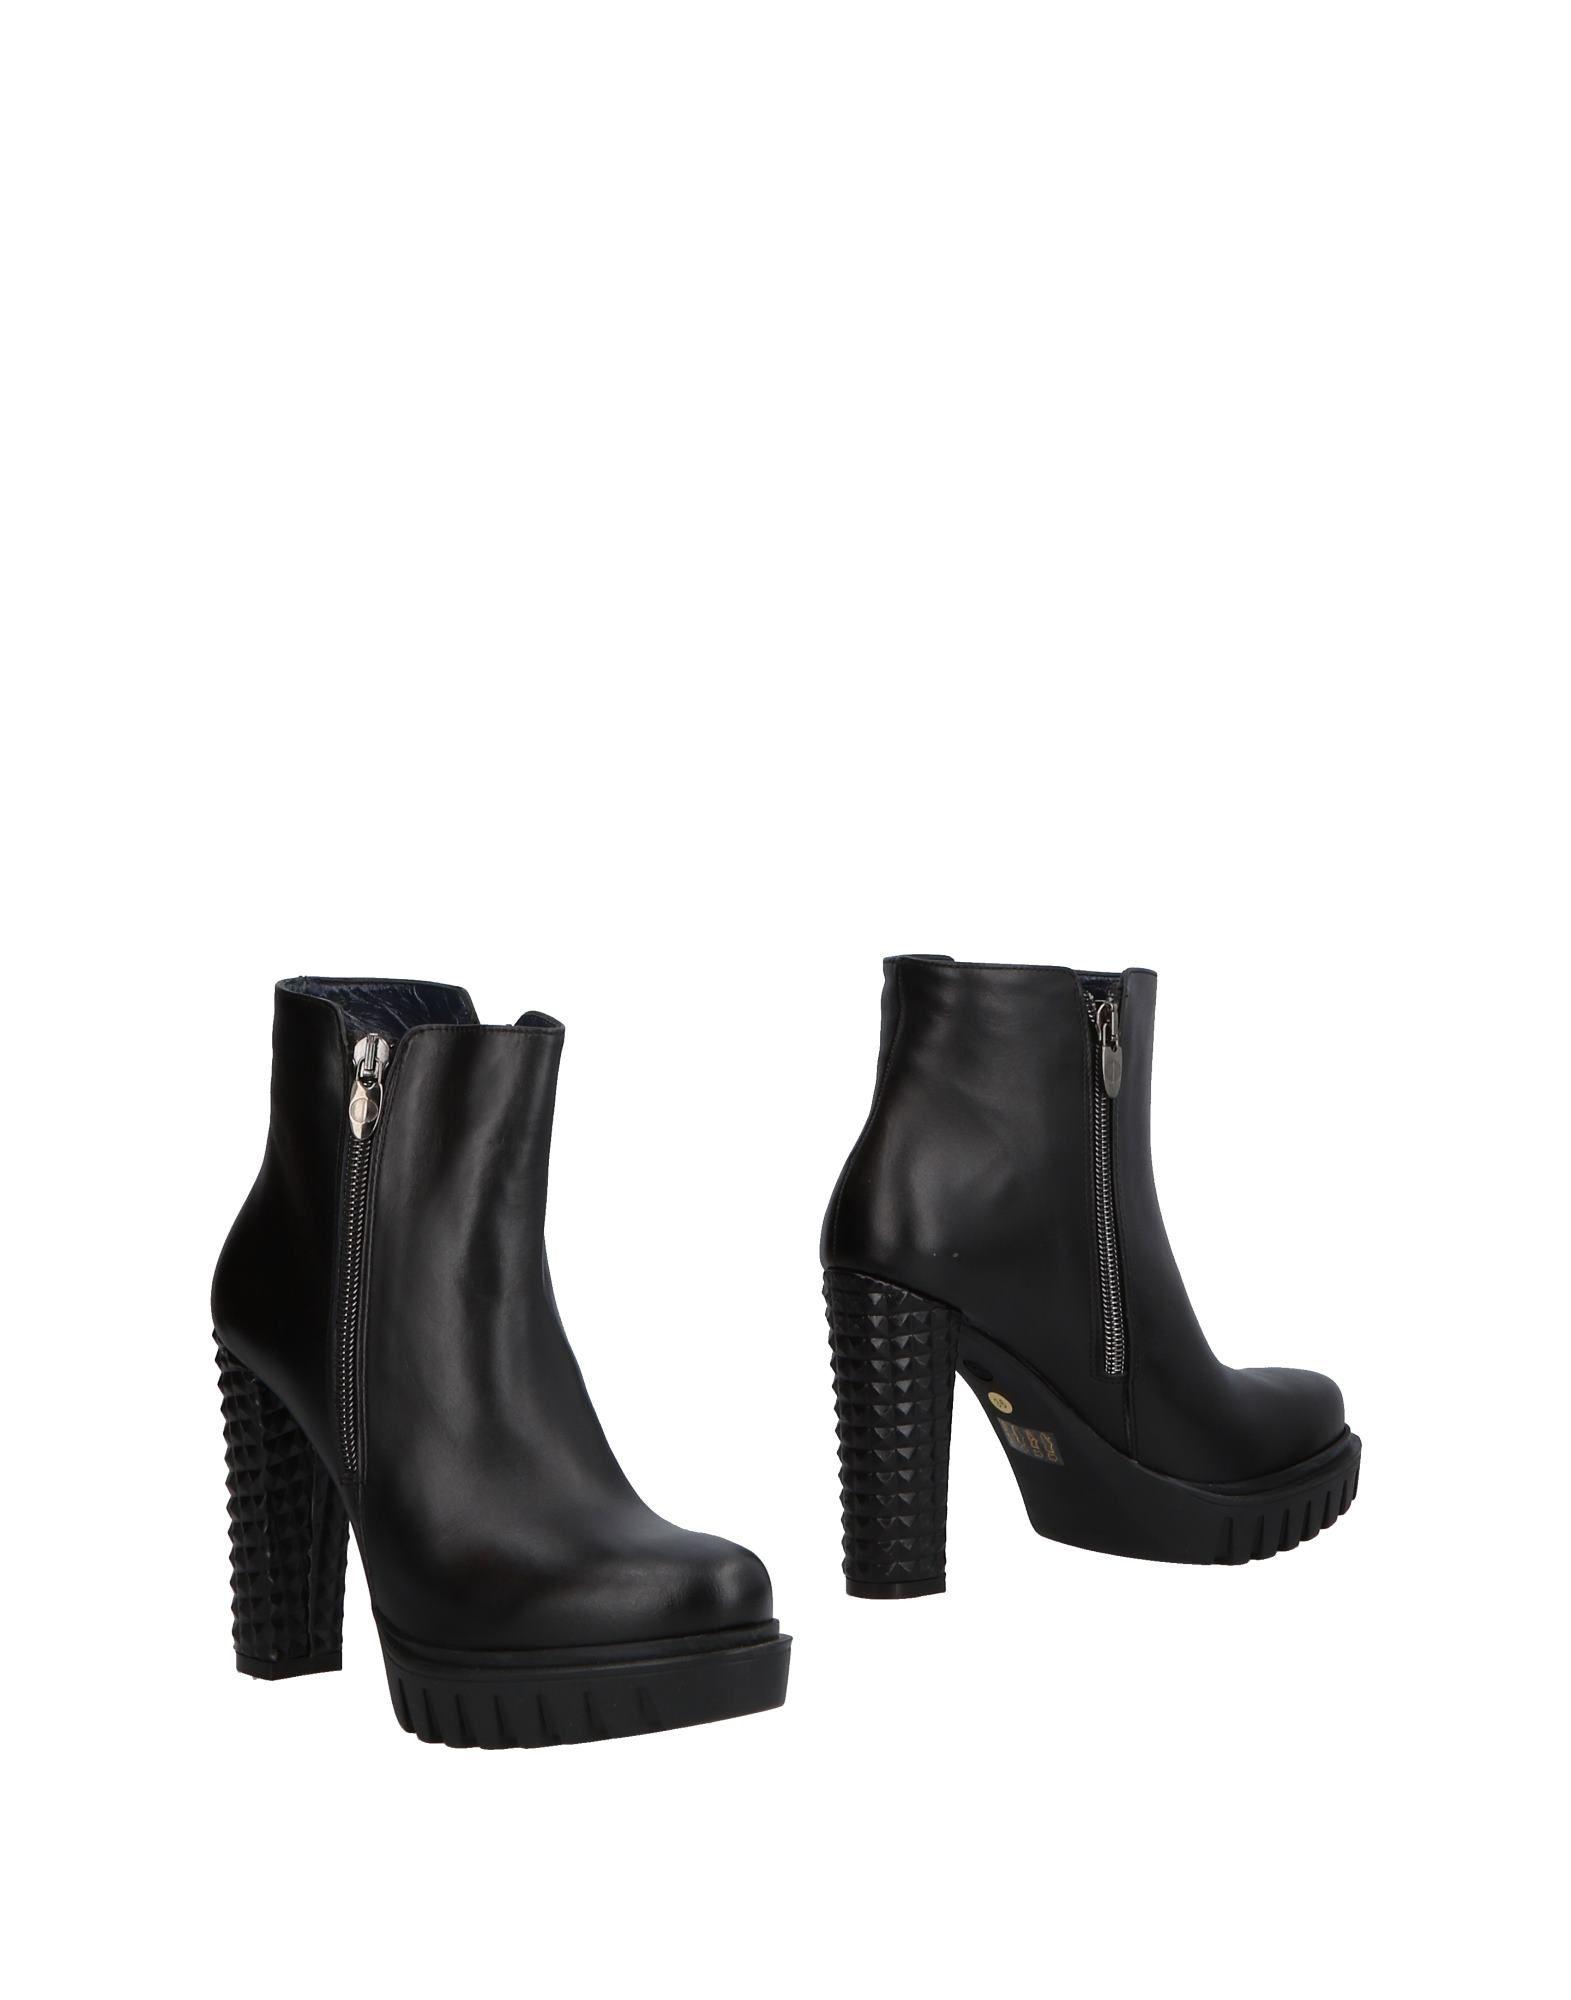 Gut Pinto um billige Schuhe zu tragenAndrea Pinto Gut Stiefelette Damen  11502274OI f38b93